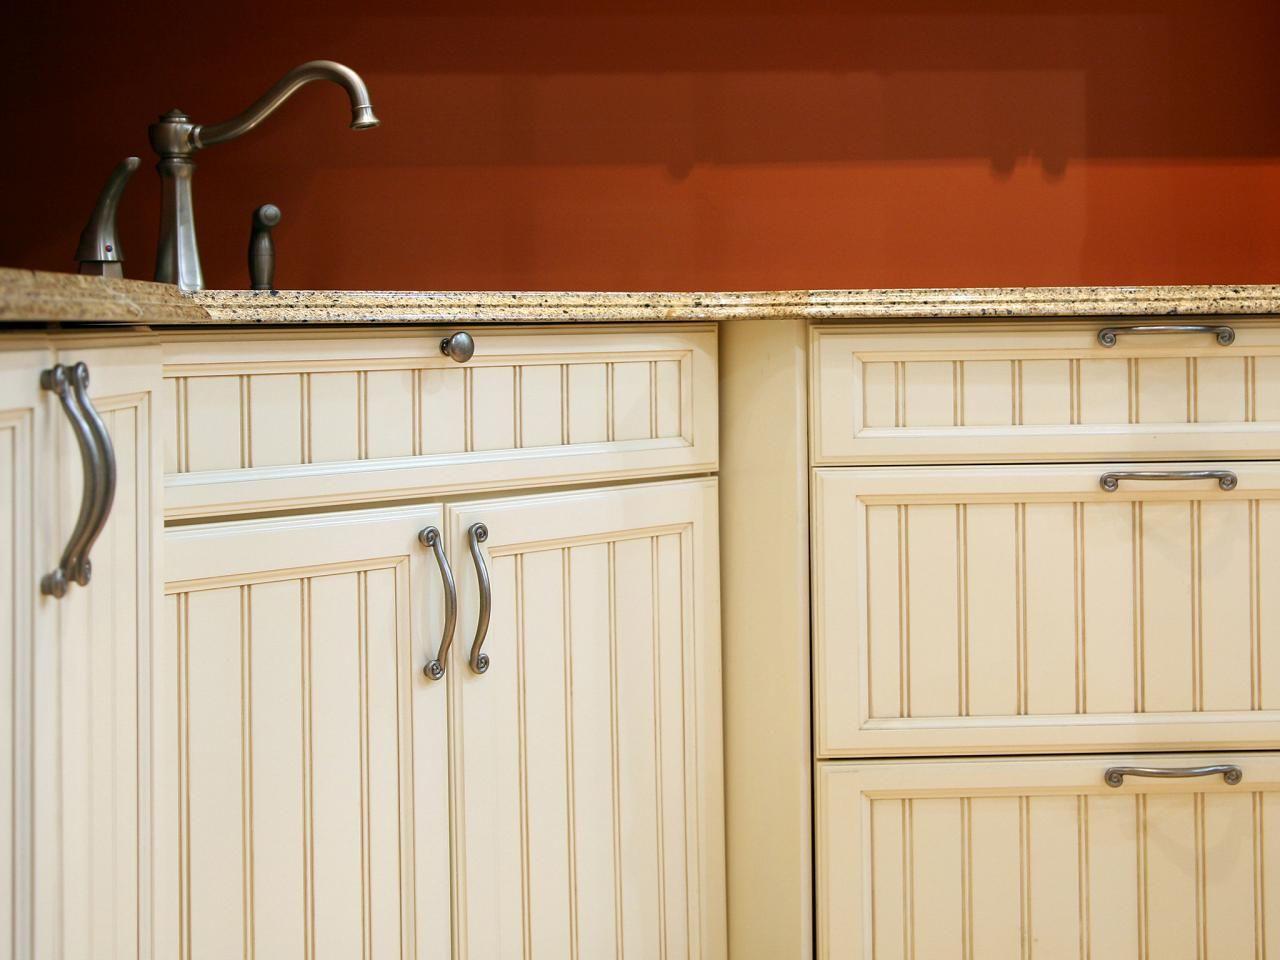 Kitchen Cabinet Door Handles Knobs Rustic Kitchen Cabinets Photo